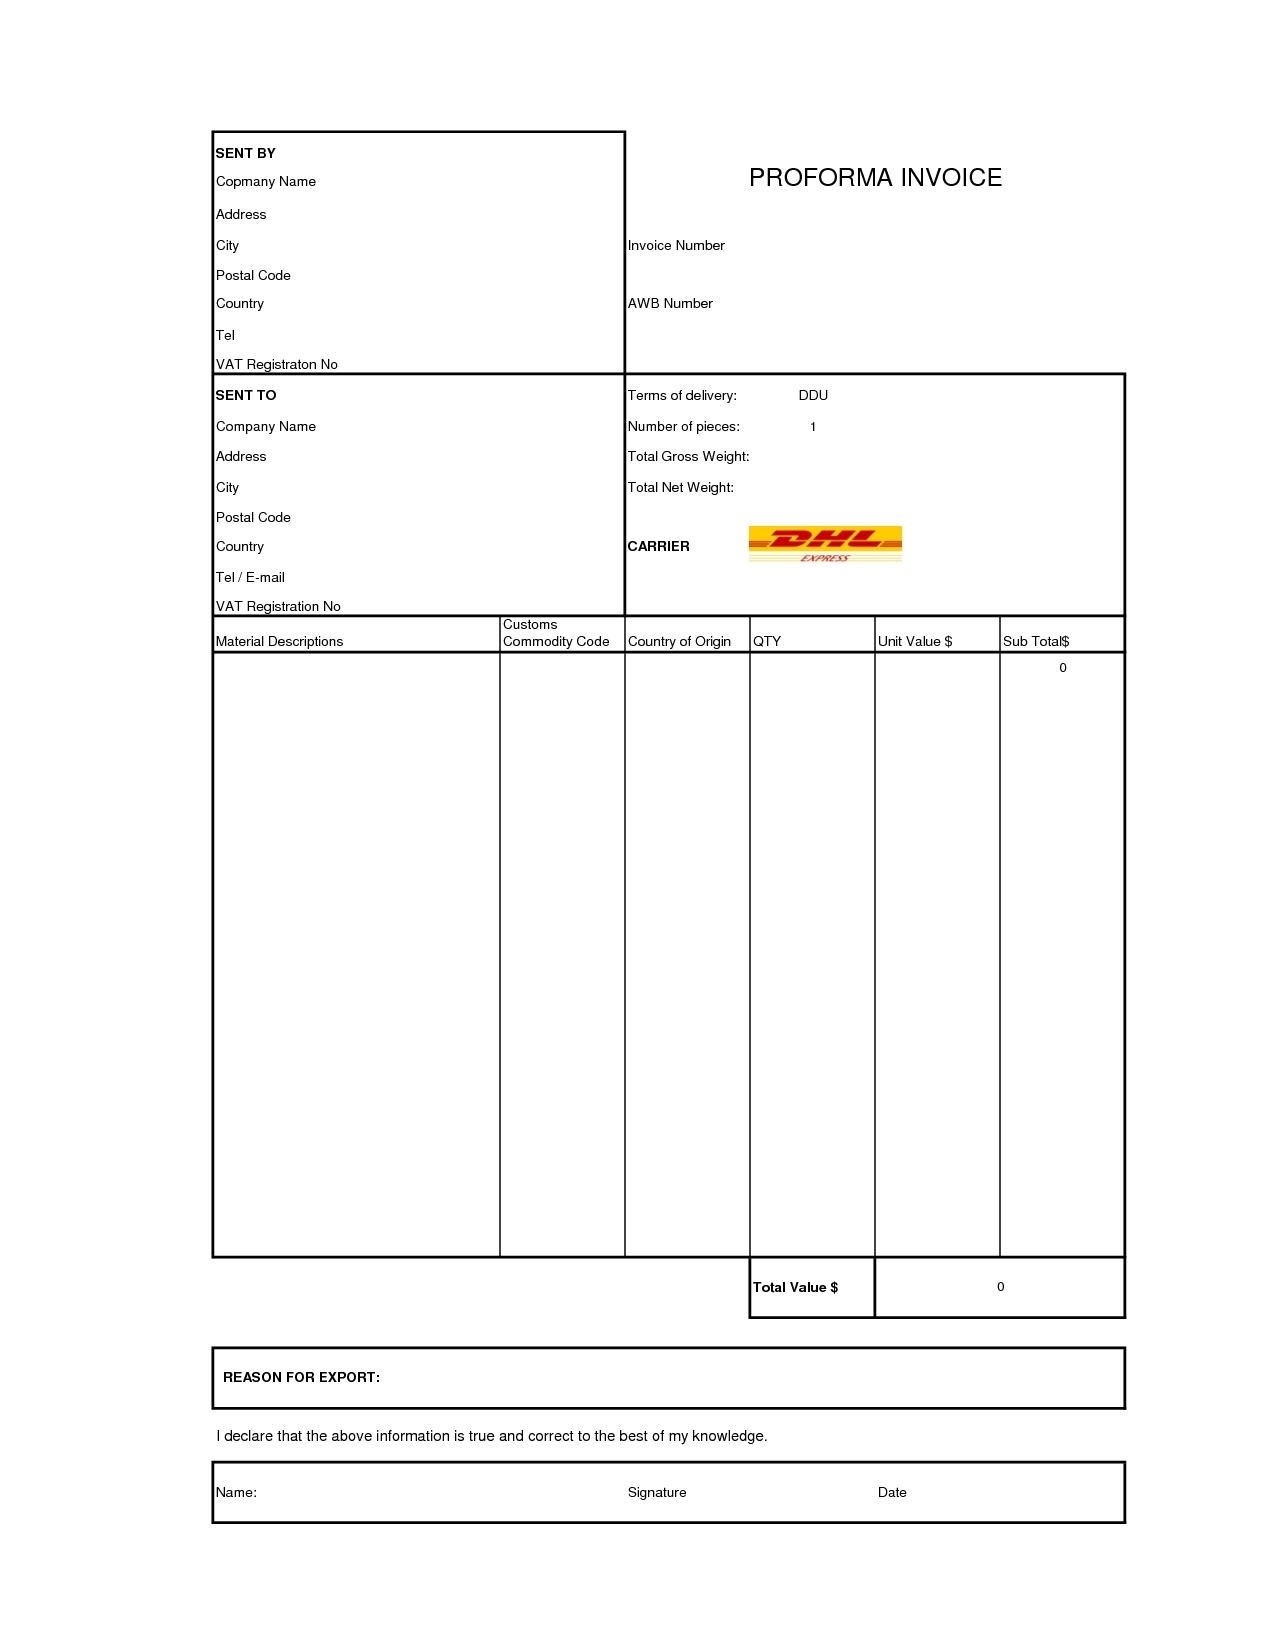 dhl pro forma invoice invoice template ideas. Black Bedroom Furniture Sets. Home Design Ideas